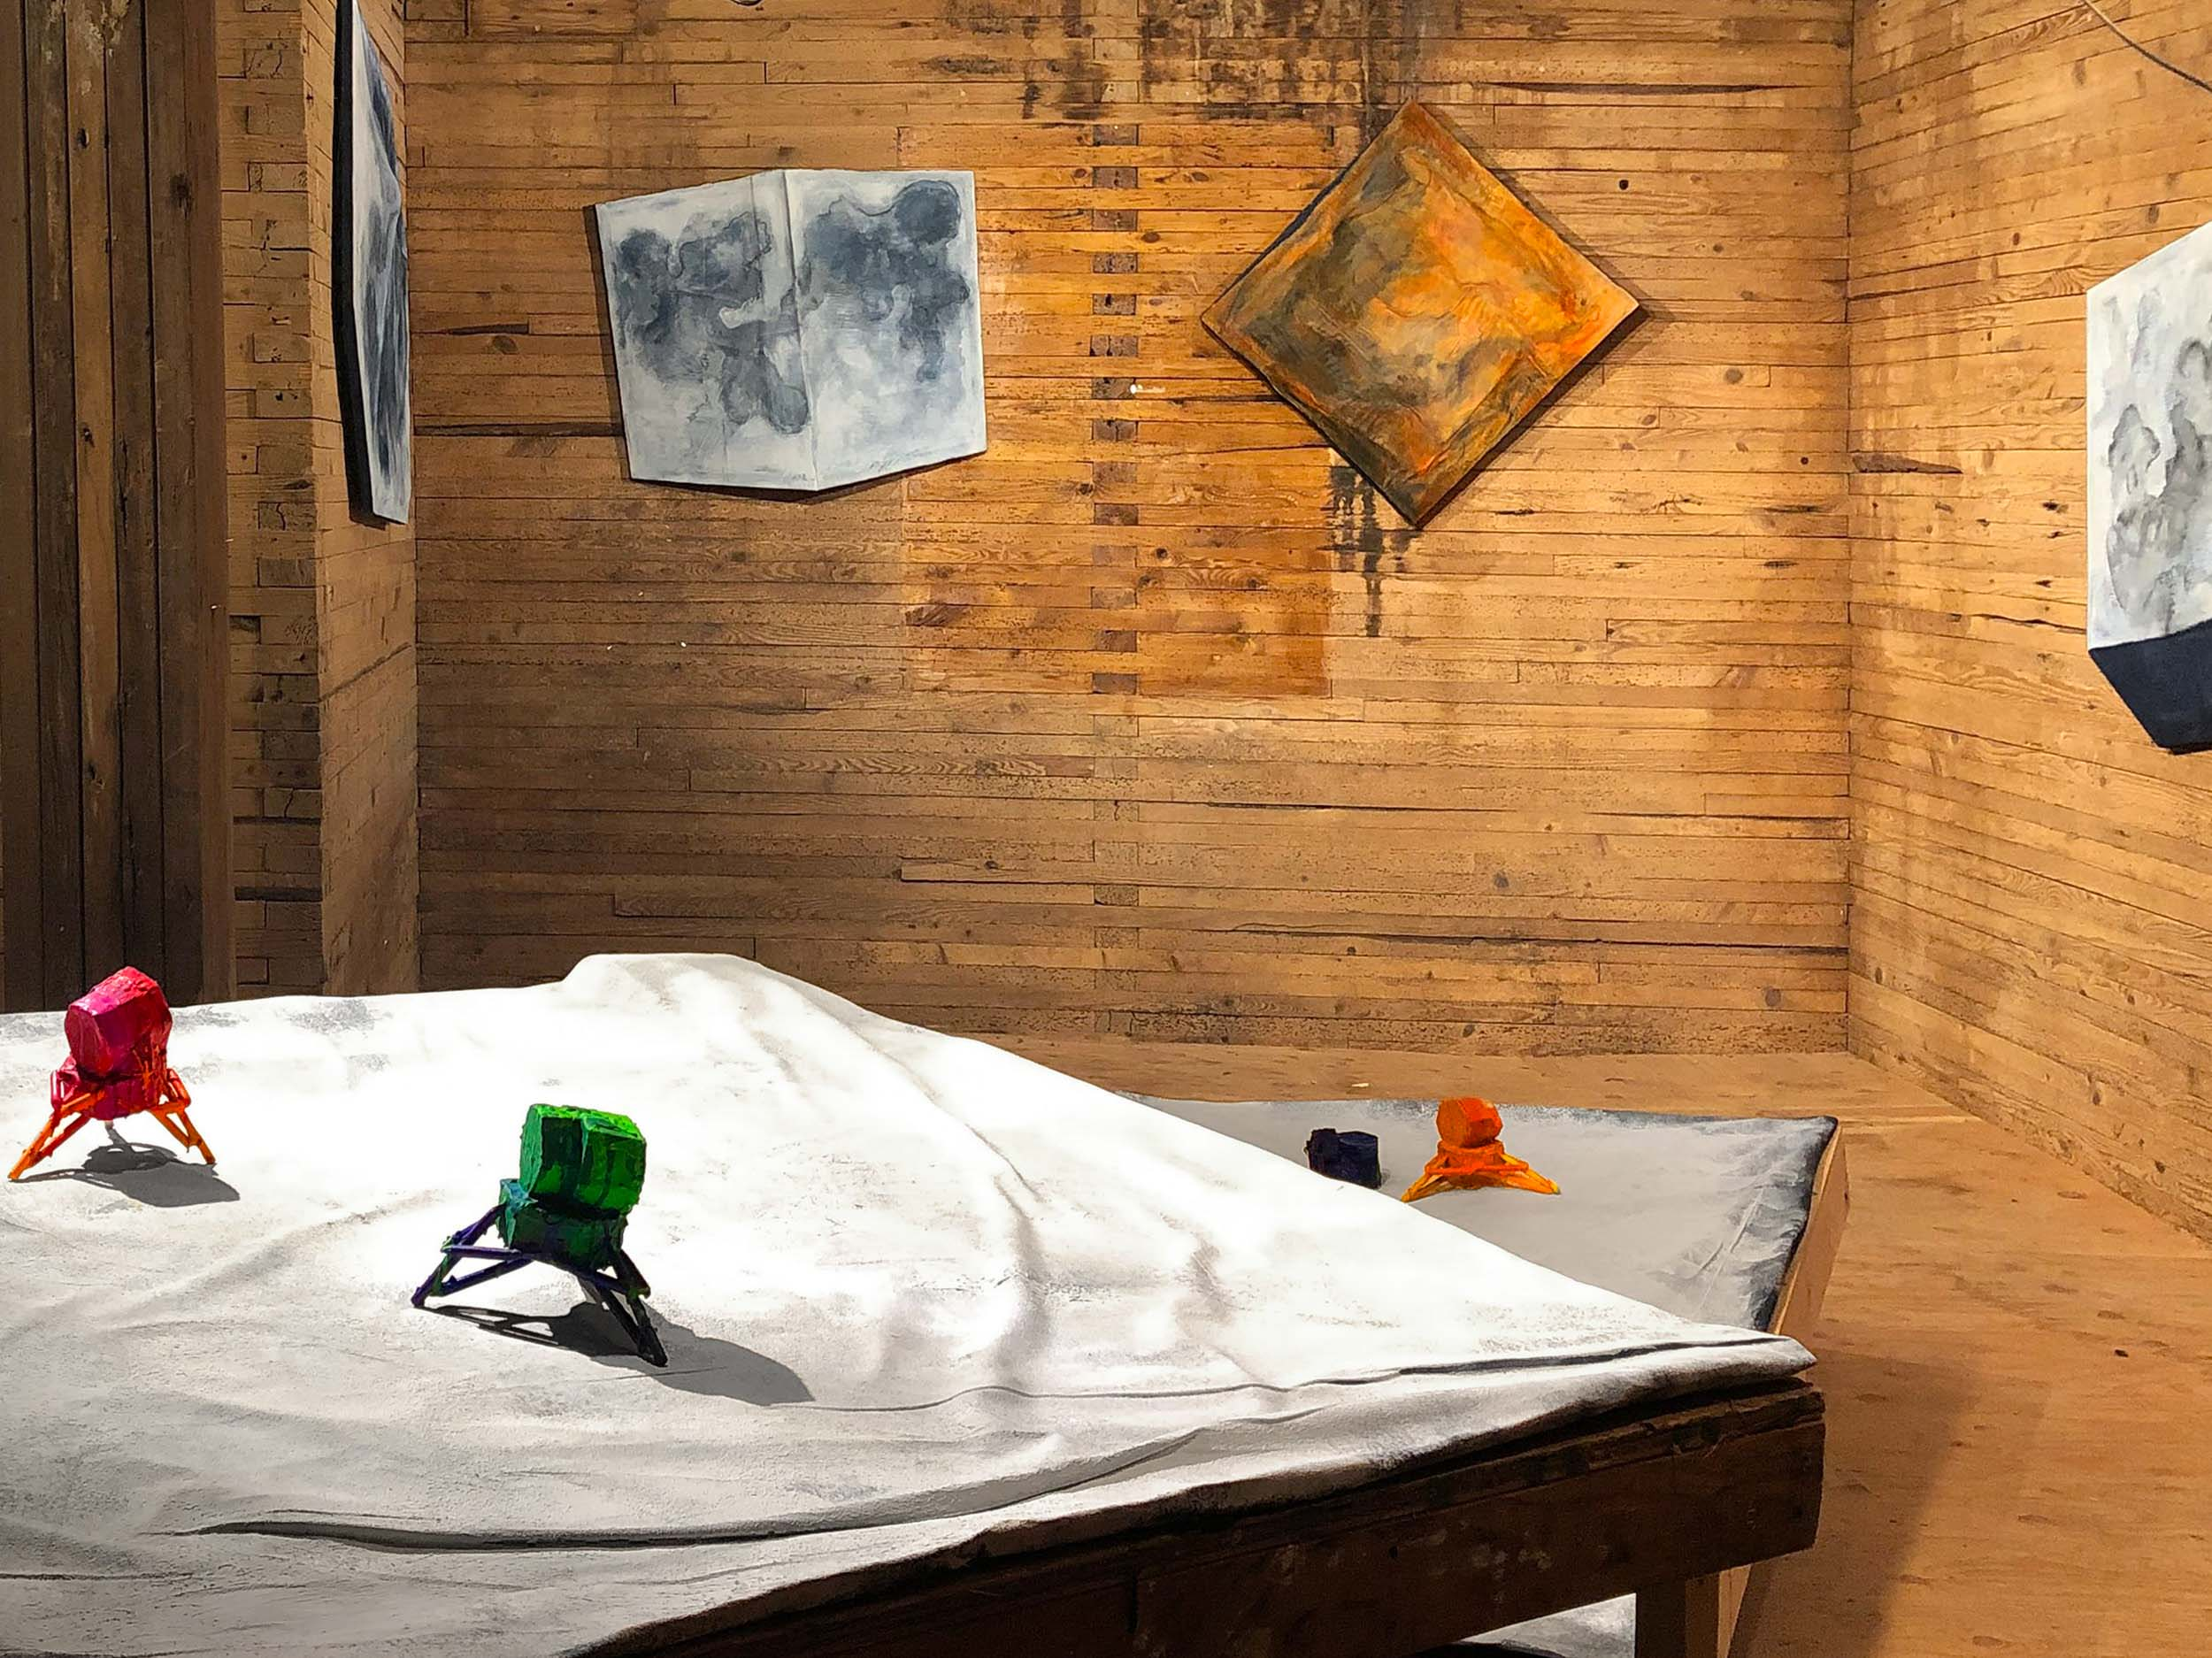 wassaic-project-artist-daniel-zeese-cube-moon-2019-01-07-08-52-04.jpg